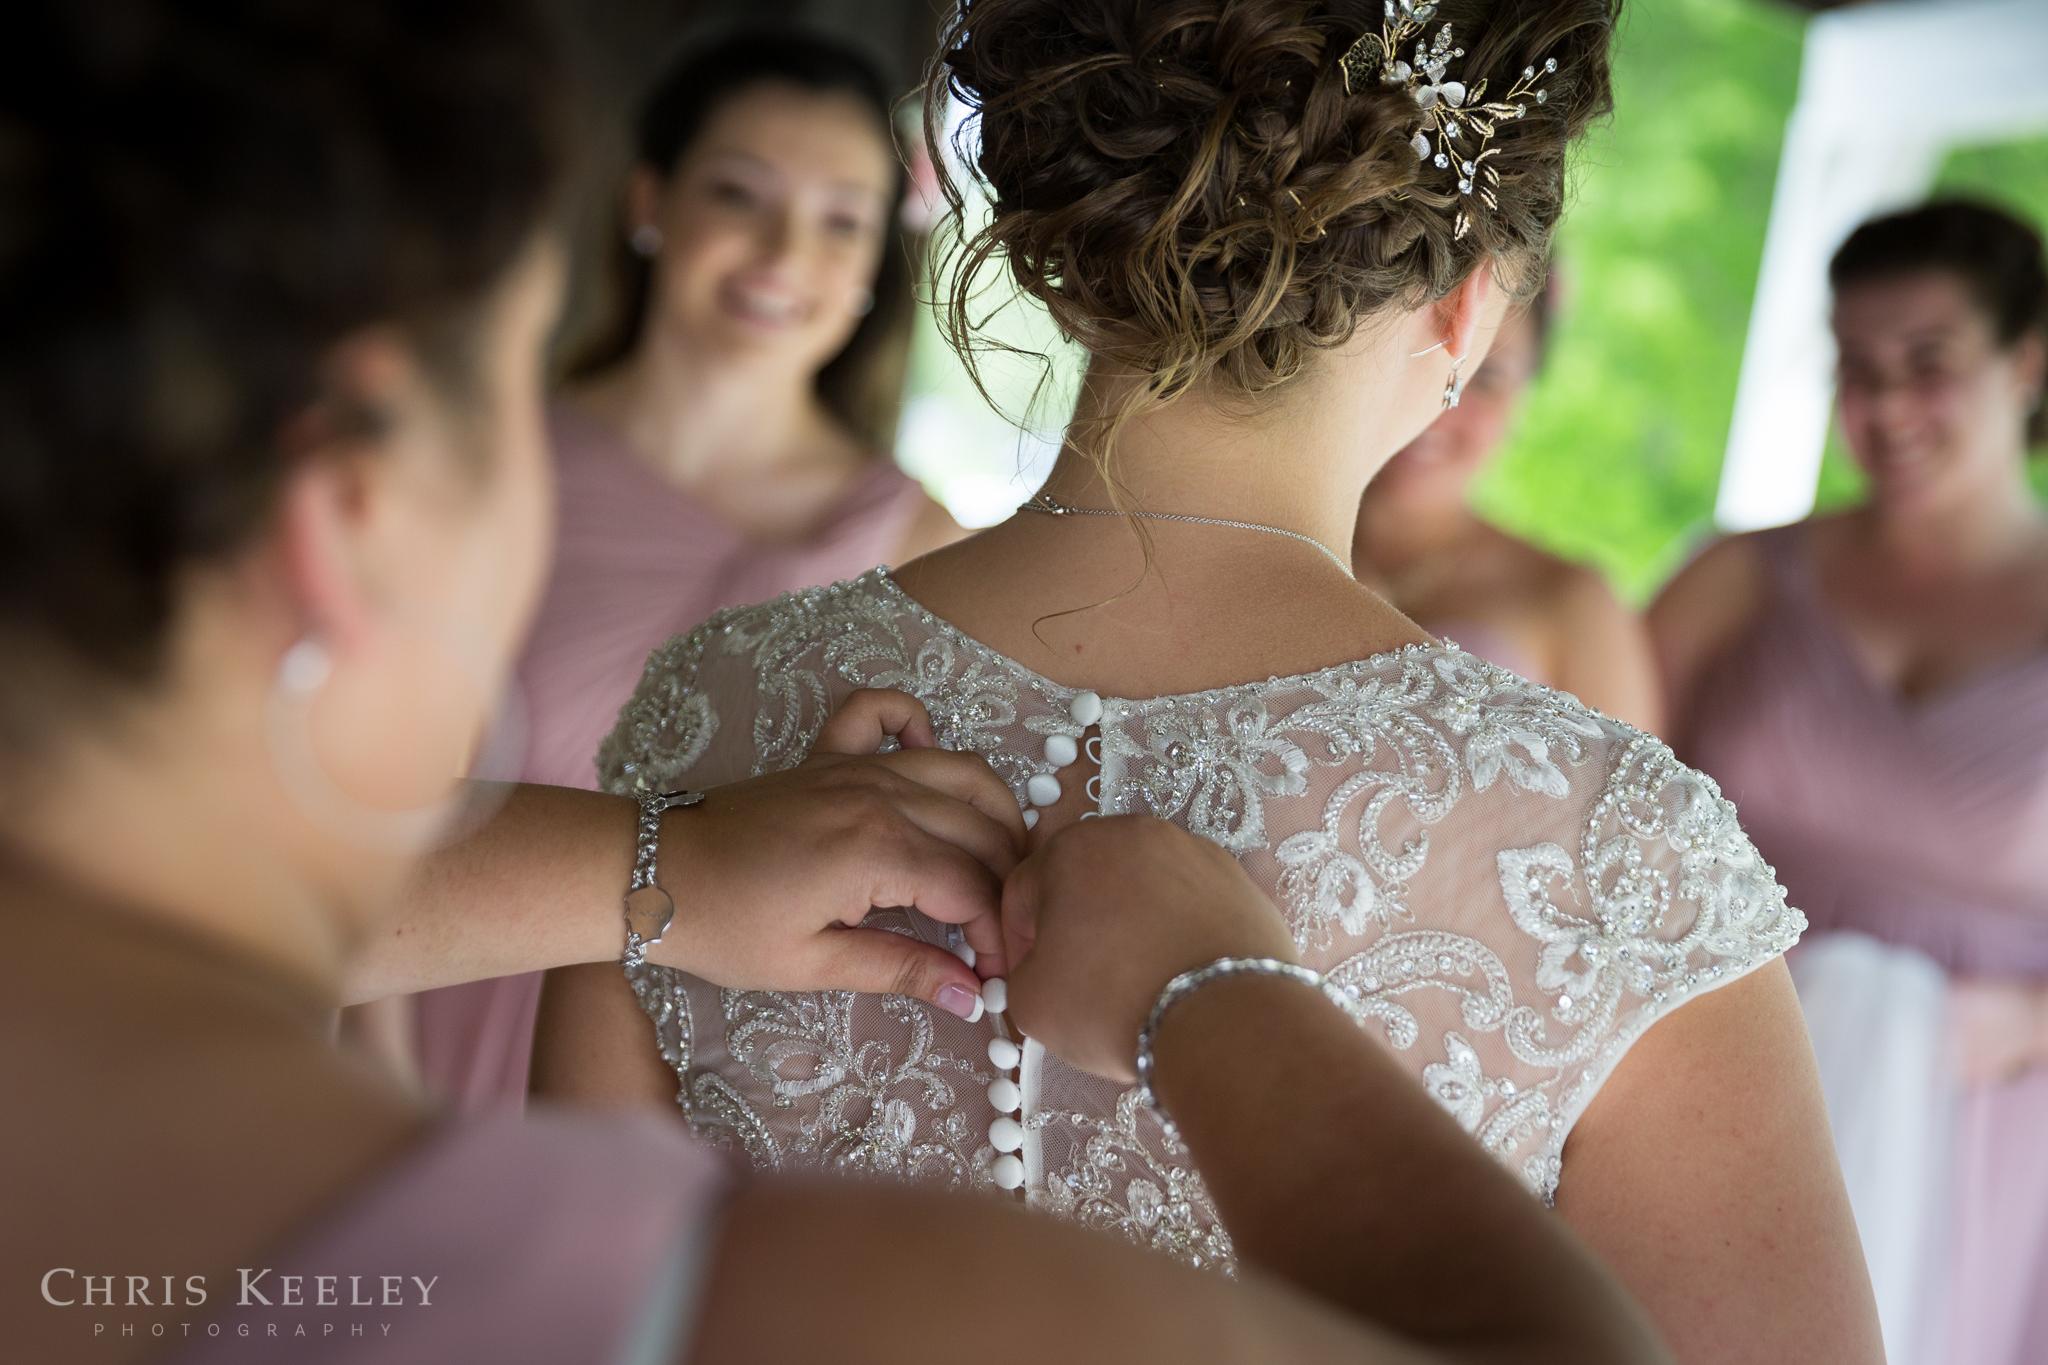 chris-keeley-photography-new-hampshire-wedding-photographer-08.jpg